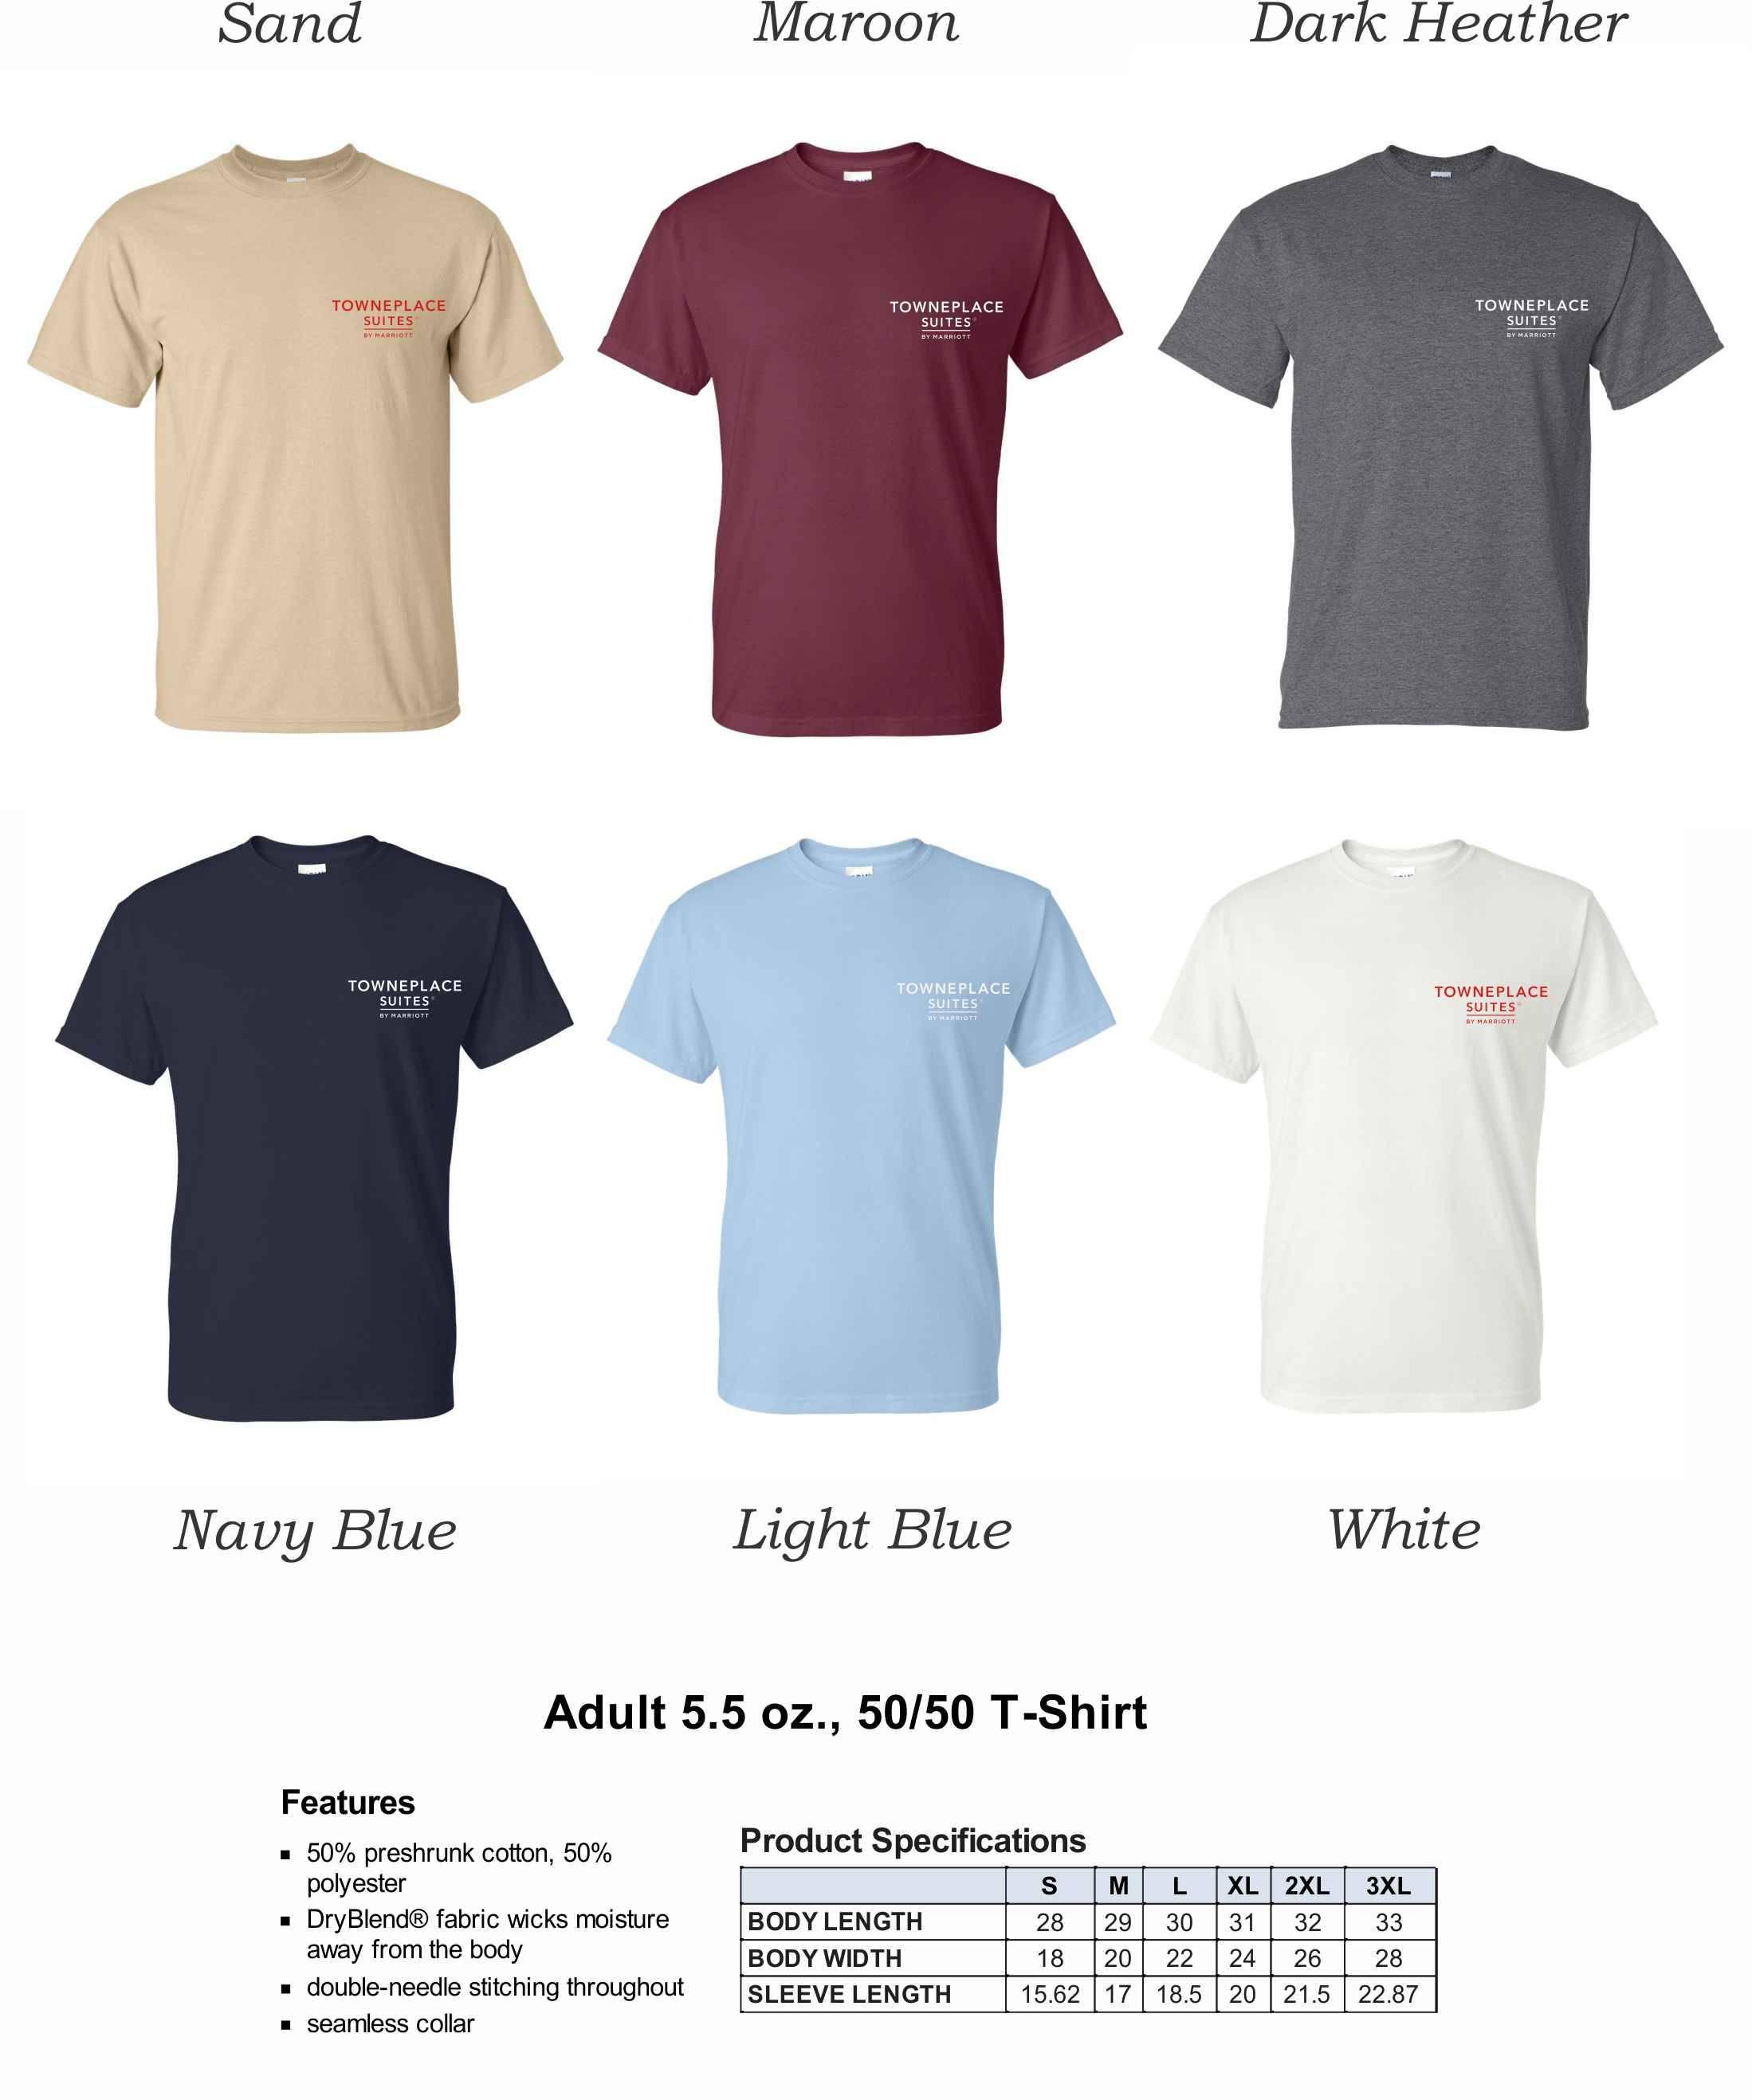 T-Shirts.   Heavyweight, 50/50 DryBlend Fabric   Silk-Screen Logo